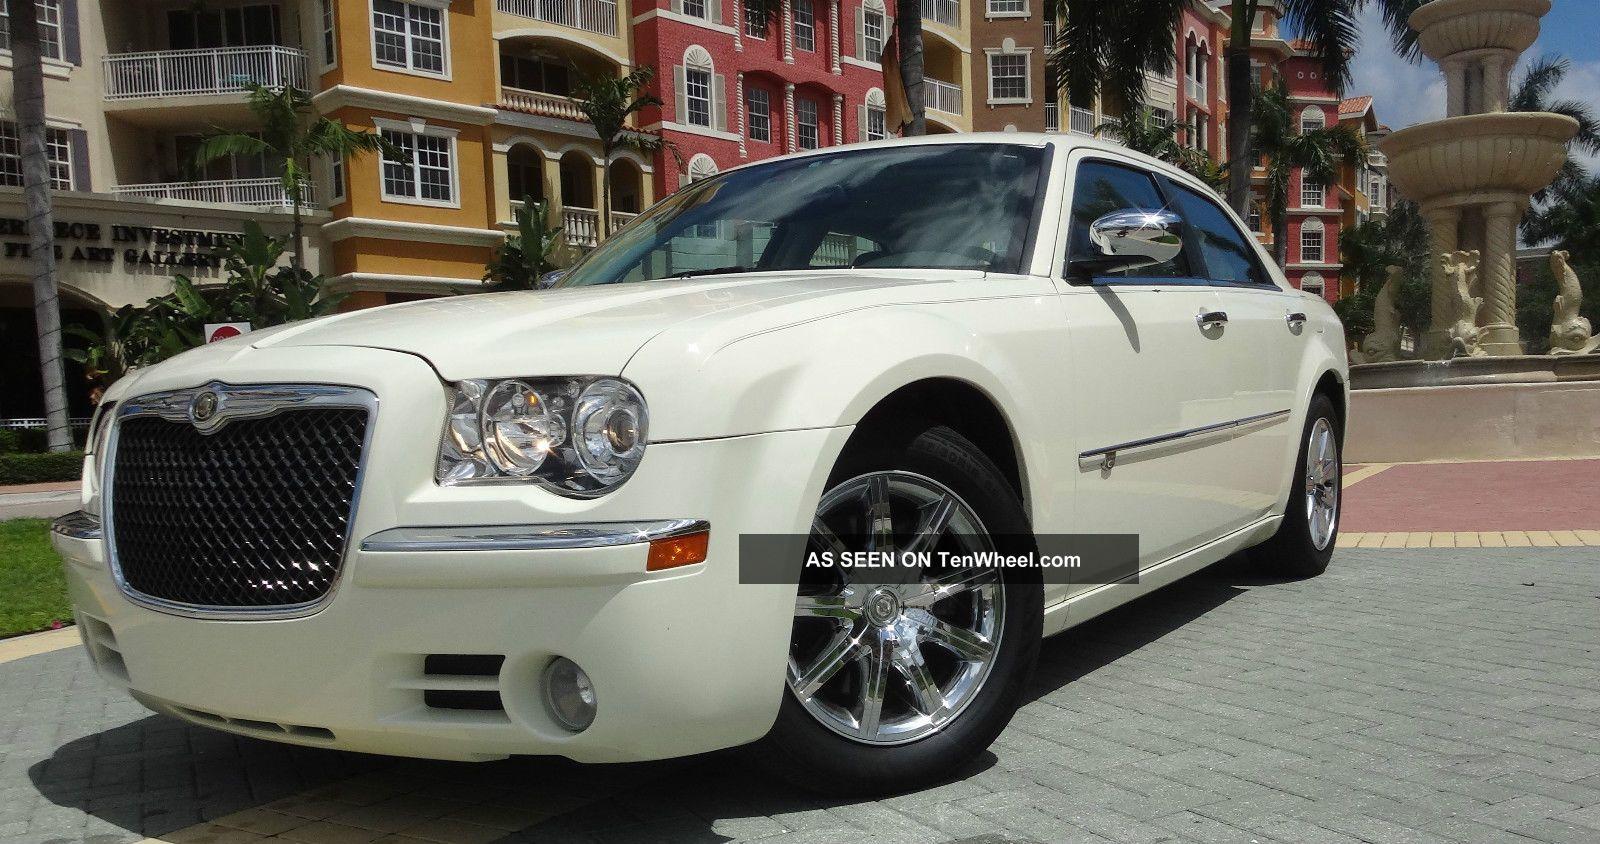 2010 chrysler 300 c sedan 4 door 5 7l hemi pearl white. Black Bedroom Furniture Sets. Home Design Ideas